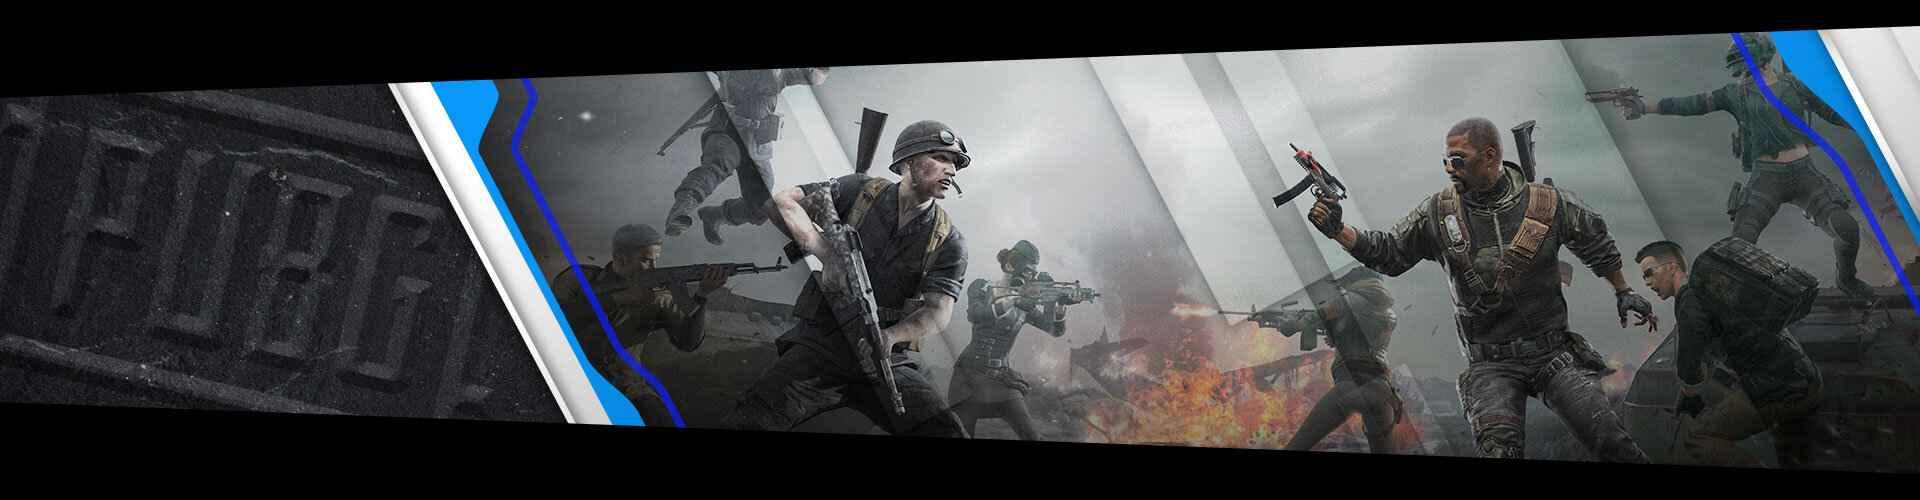 Katsojan opas PlayerUnknown's Battlegrounds (PUBG) peliin